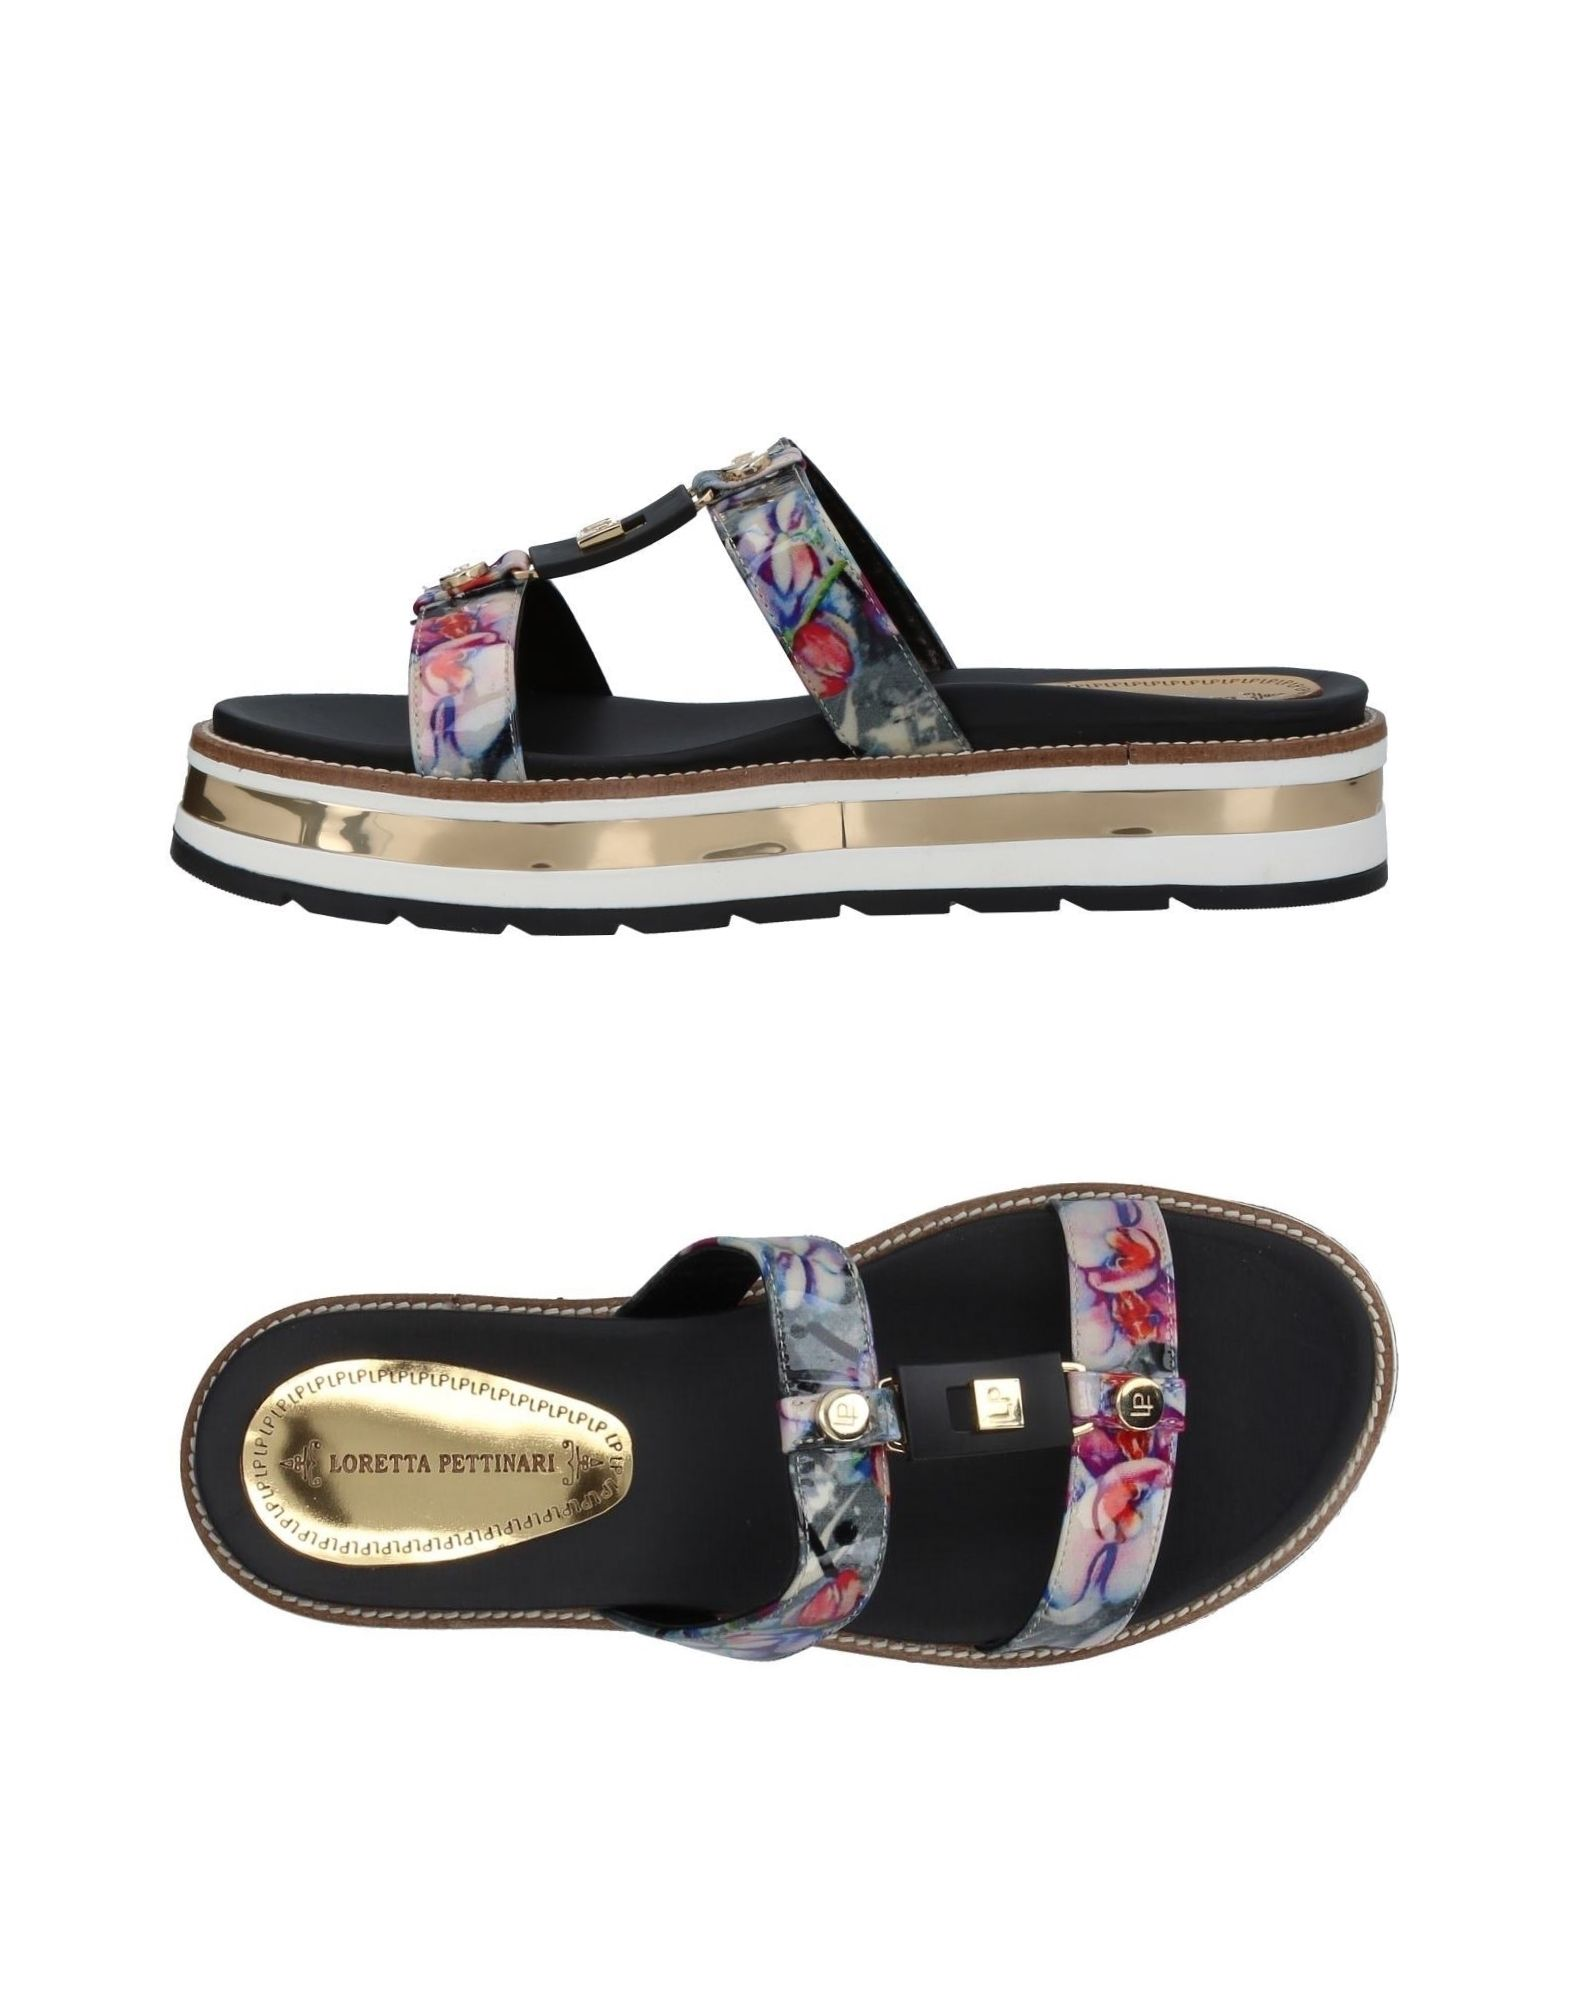 Loretta Pettinari Sandalen Damen  11387772MI Gute Qualität beliebte Schuhe